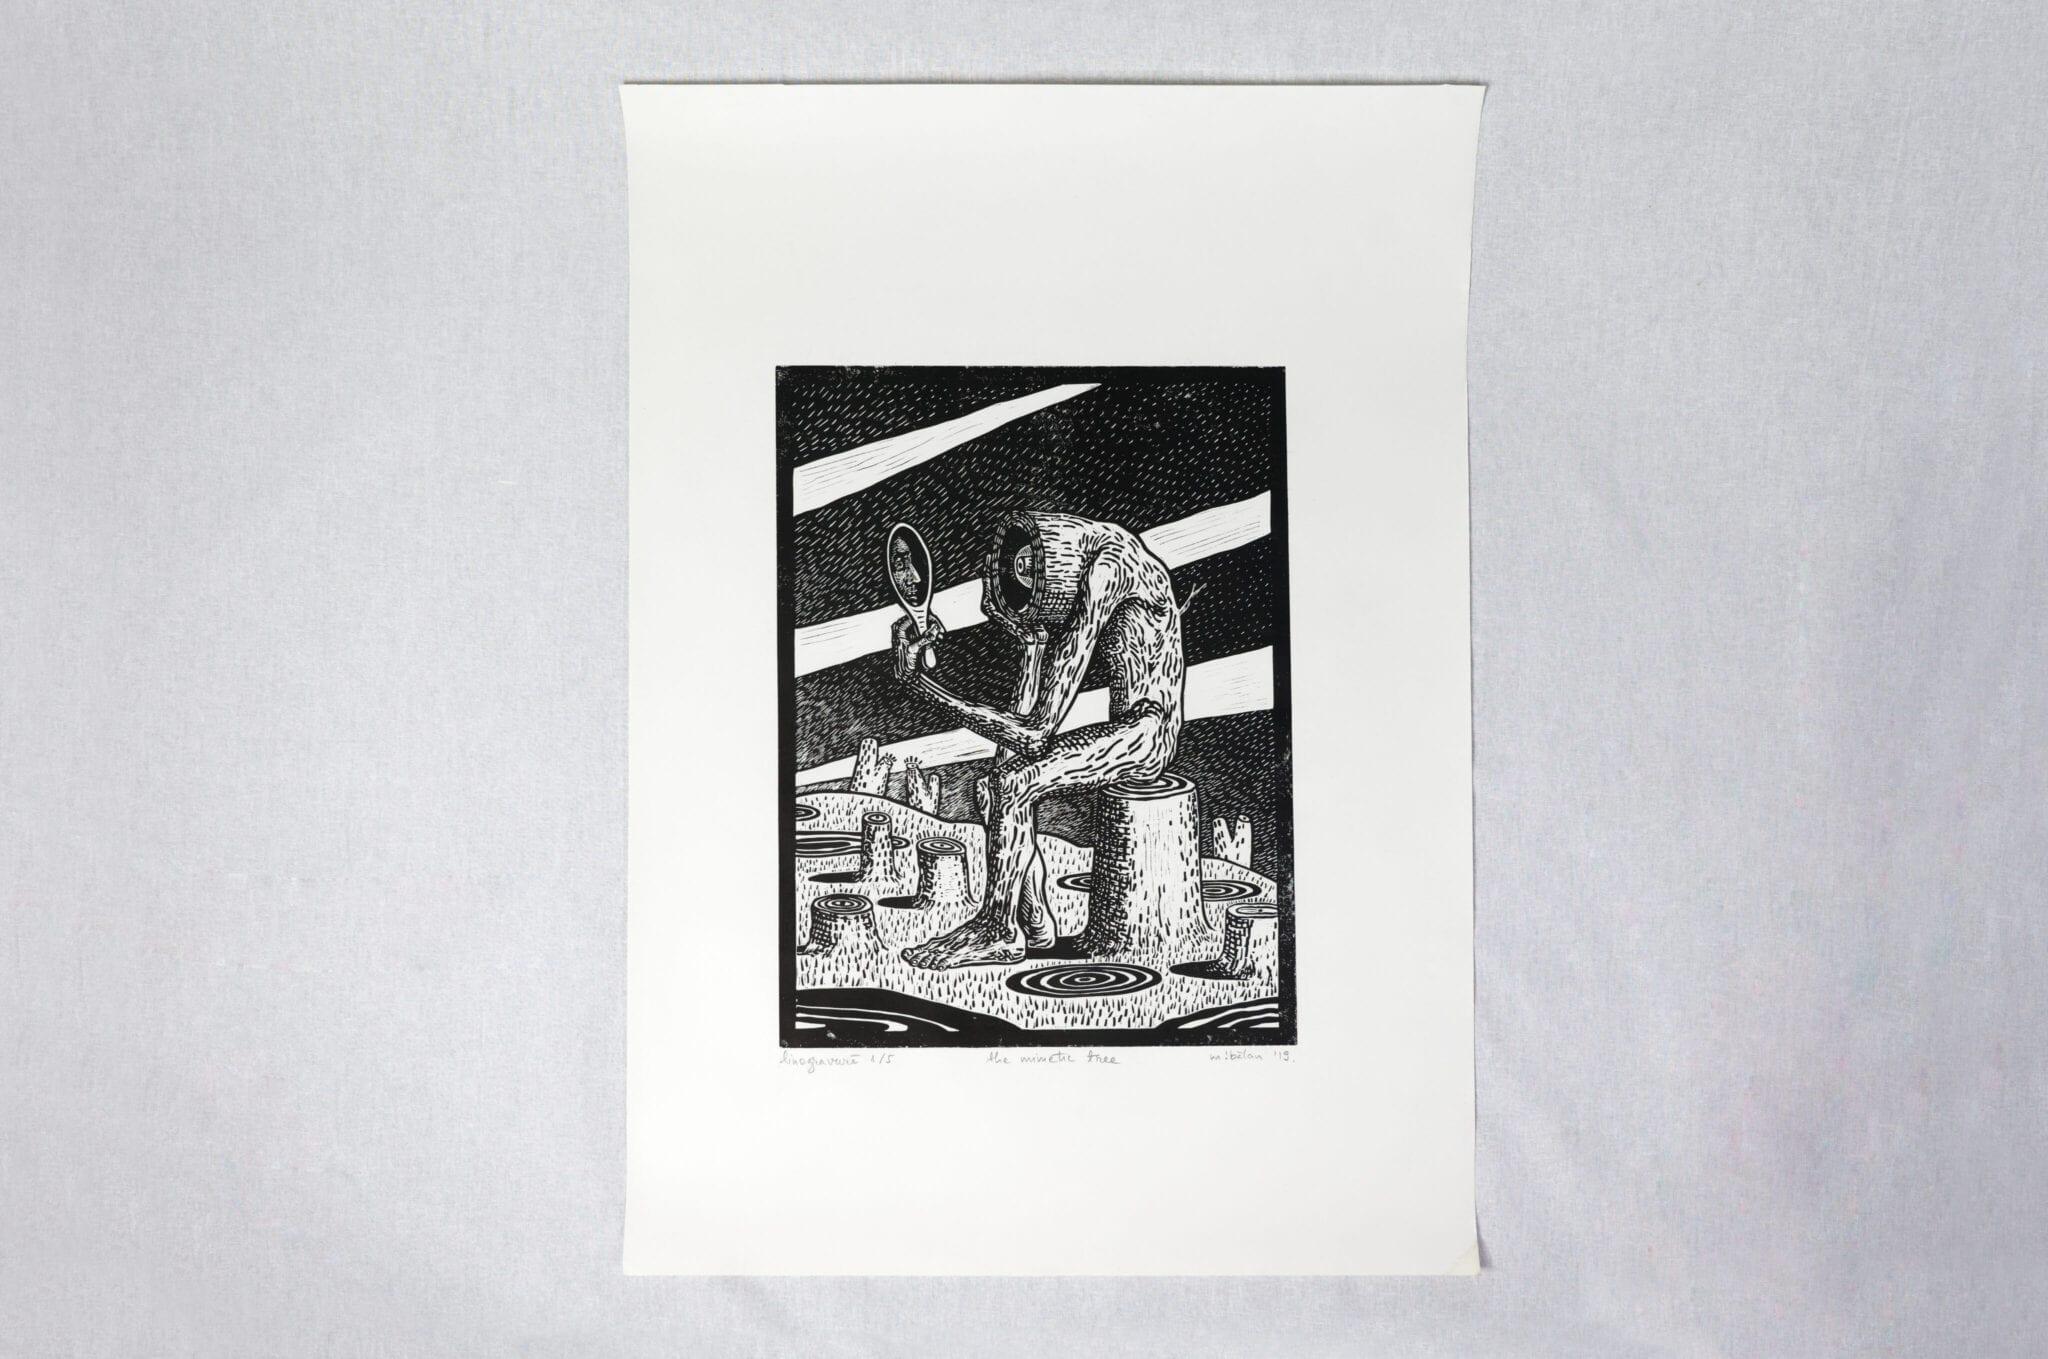 Maria Bălan - Mimetic Tree linocut print